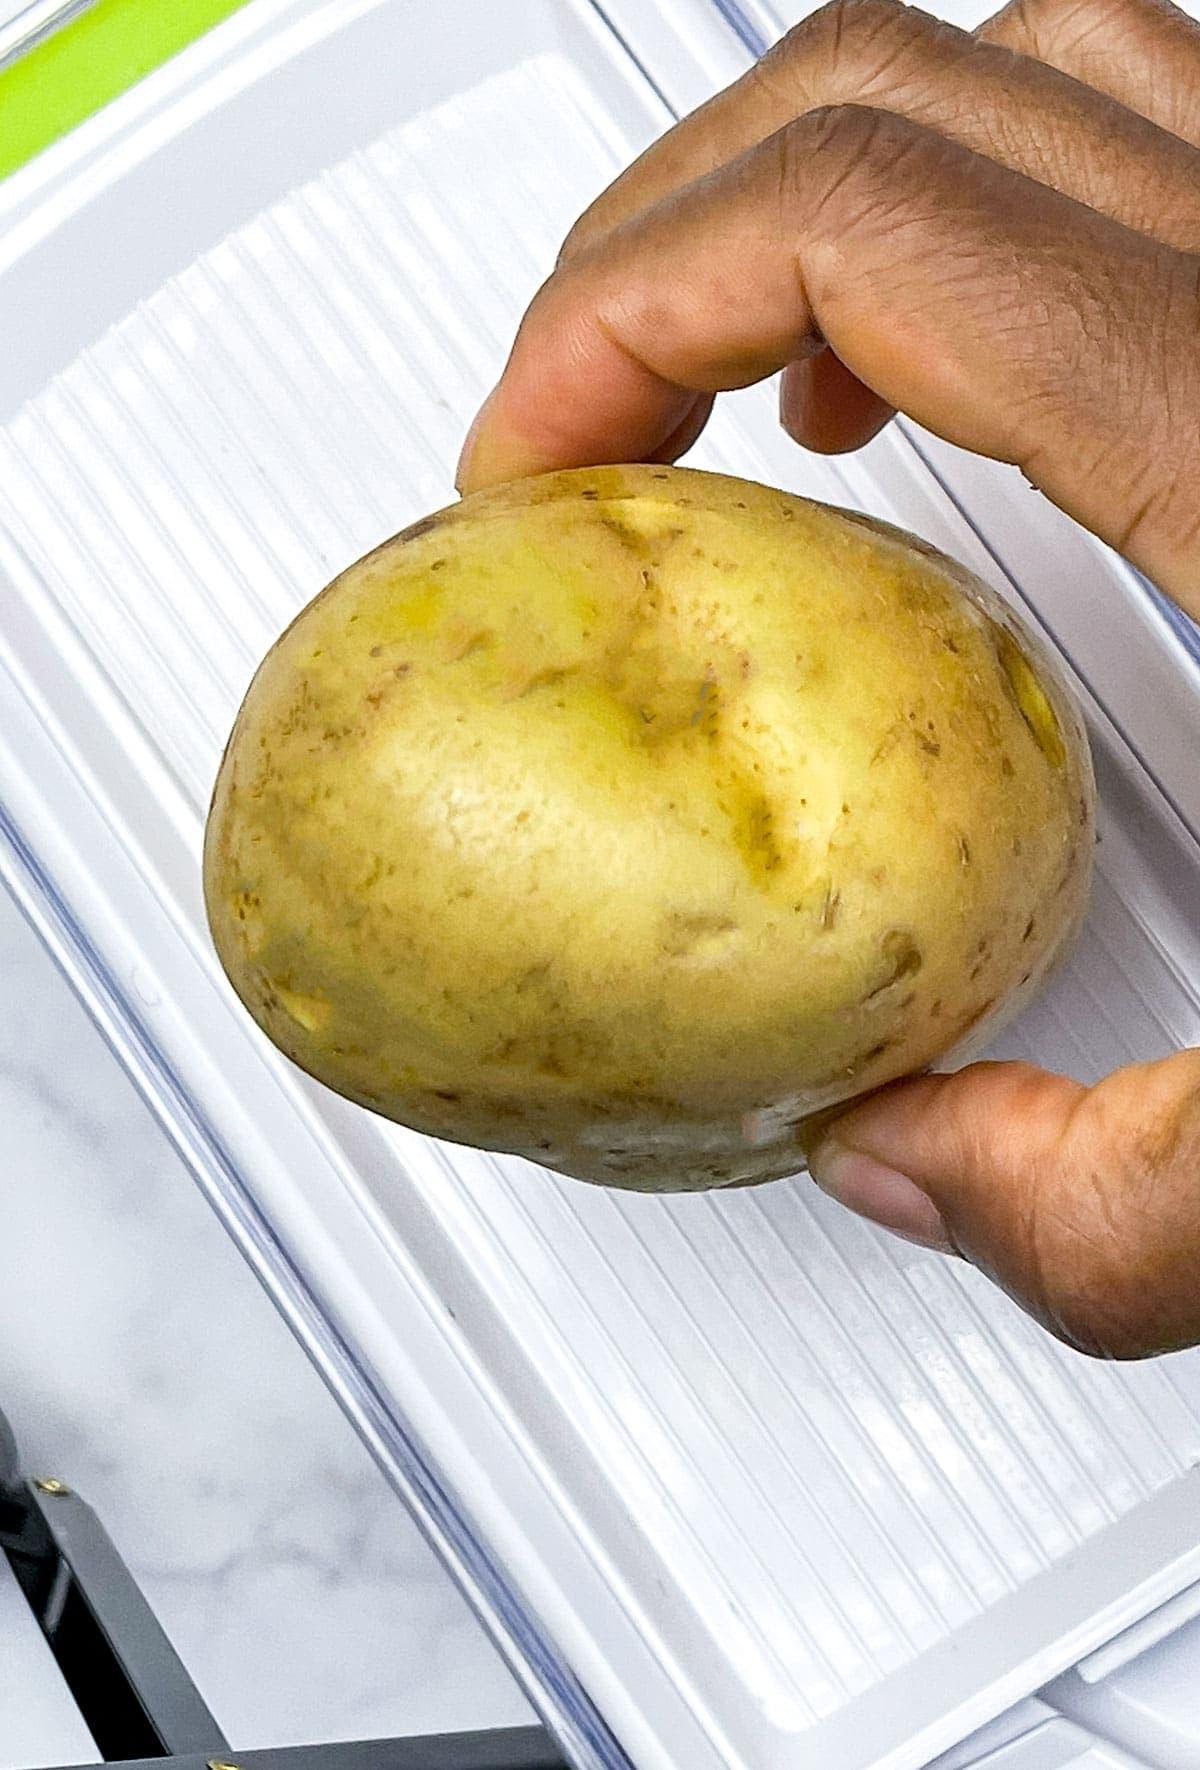 potato slices on the mandolin